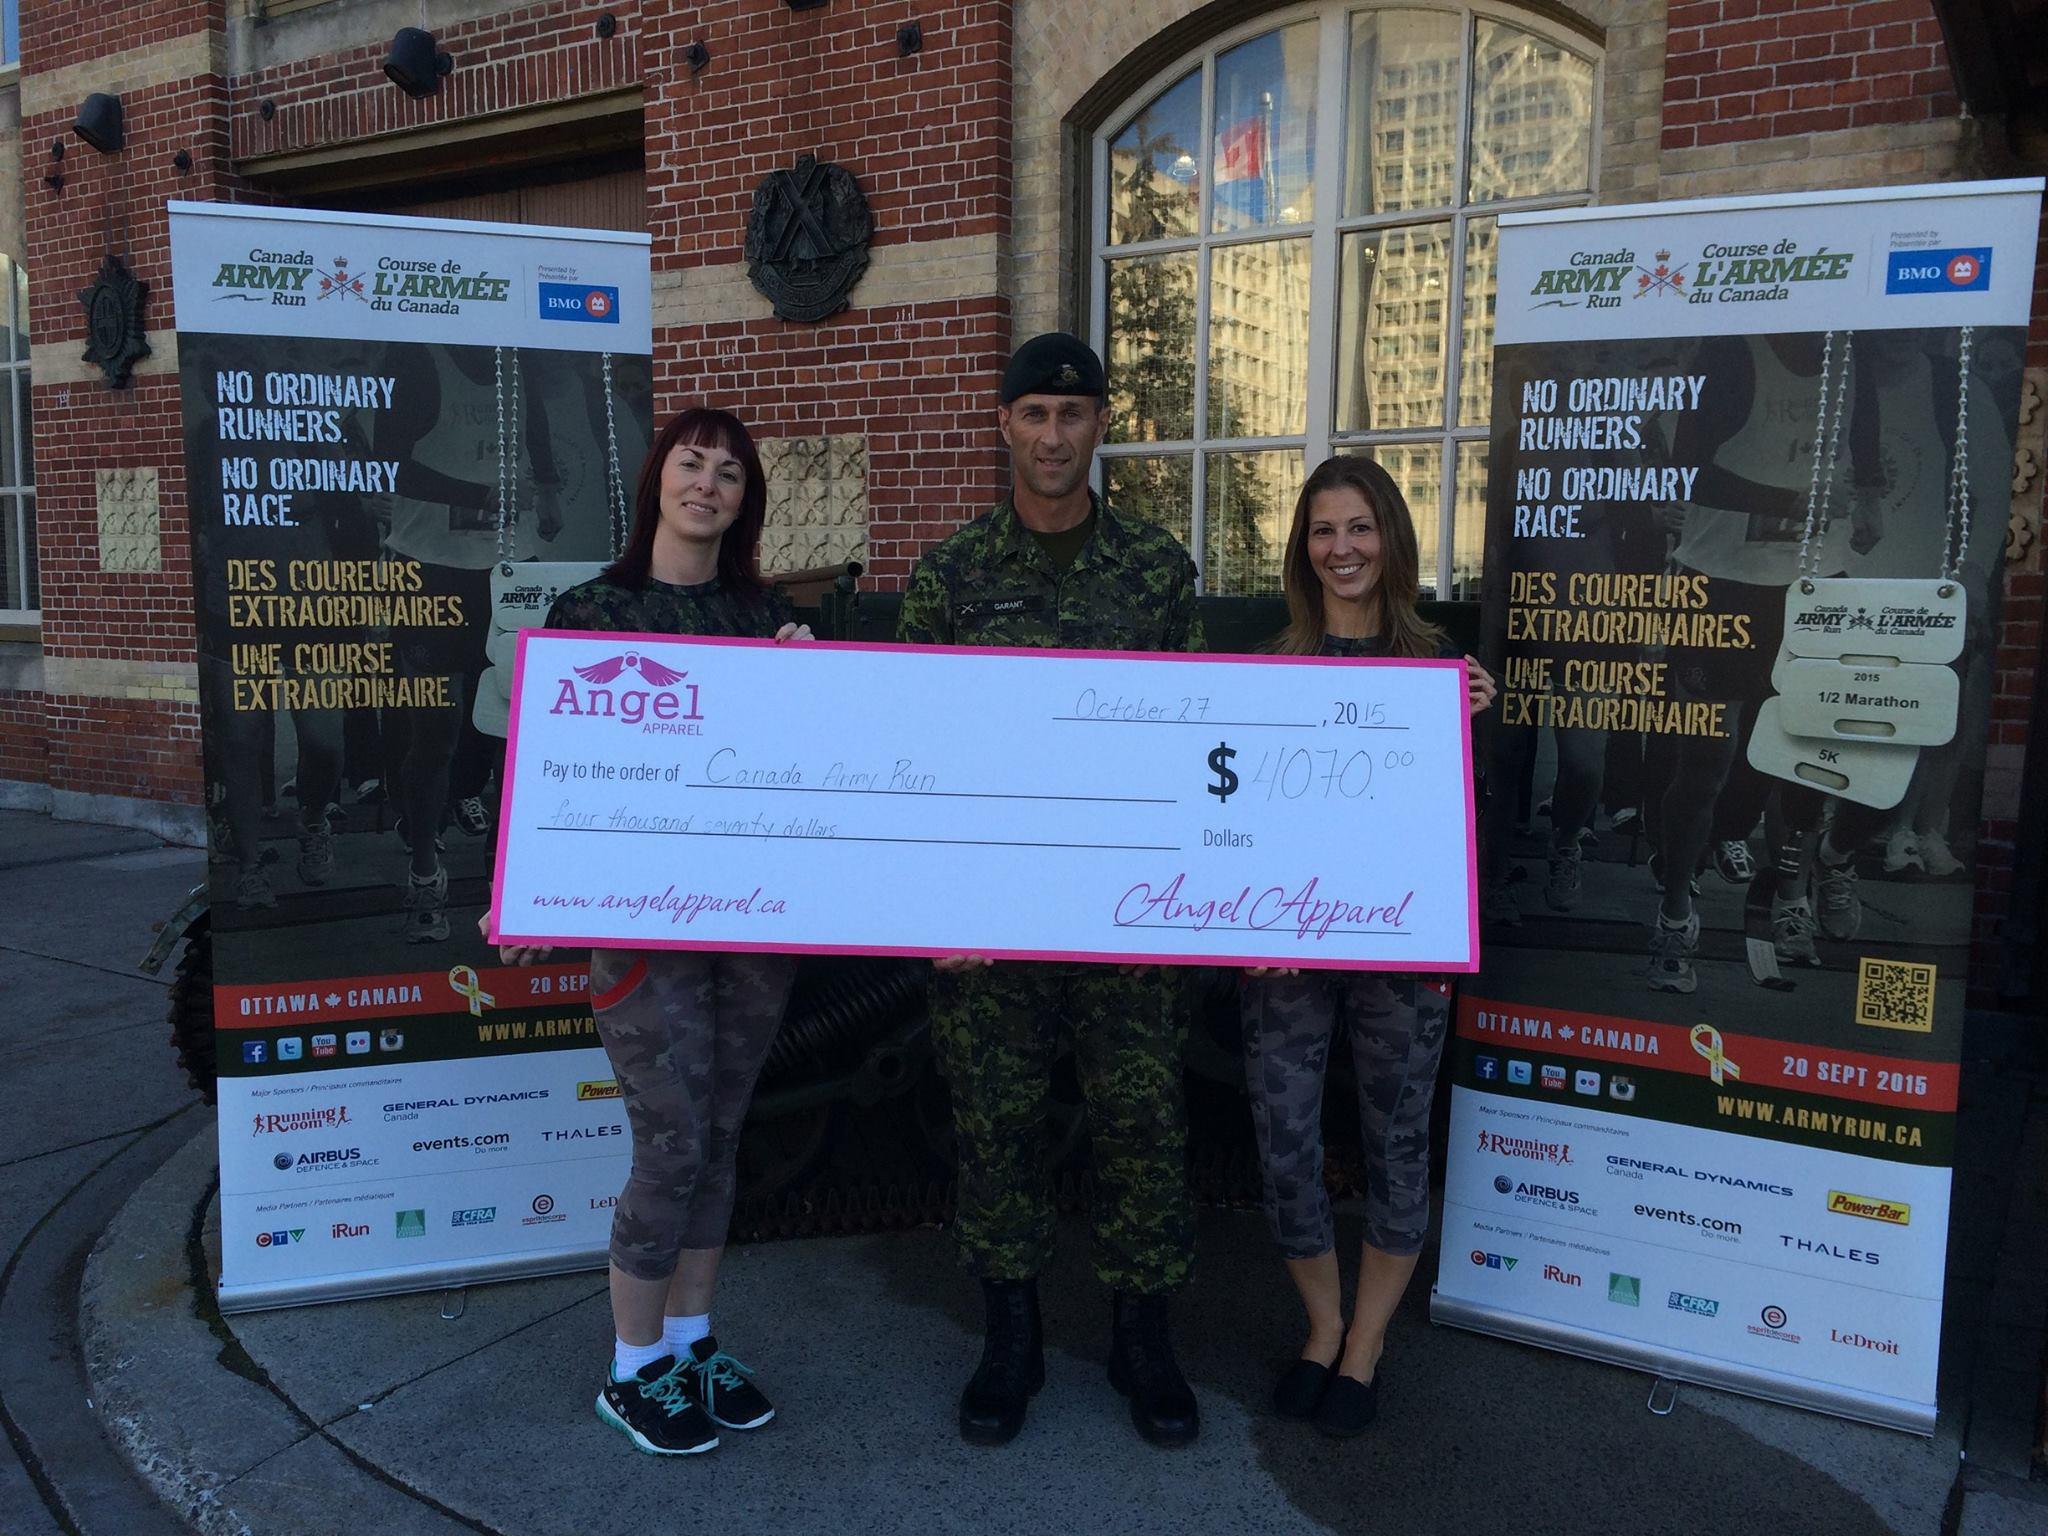 Army run cheque presentation